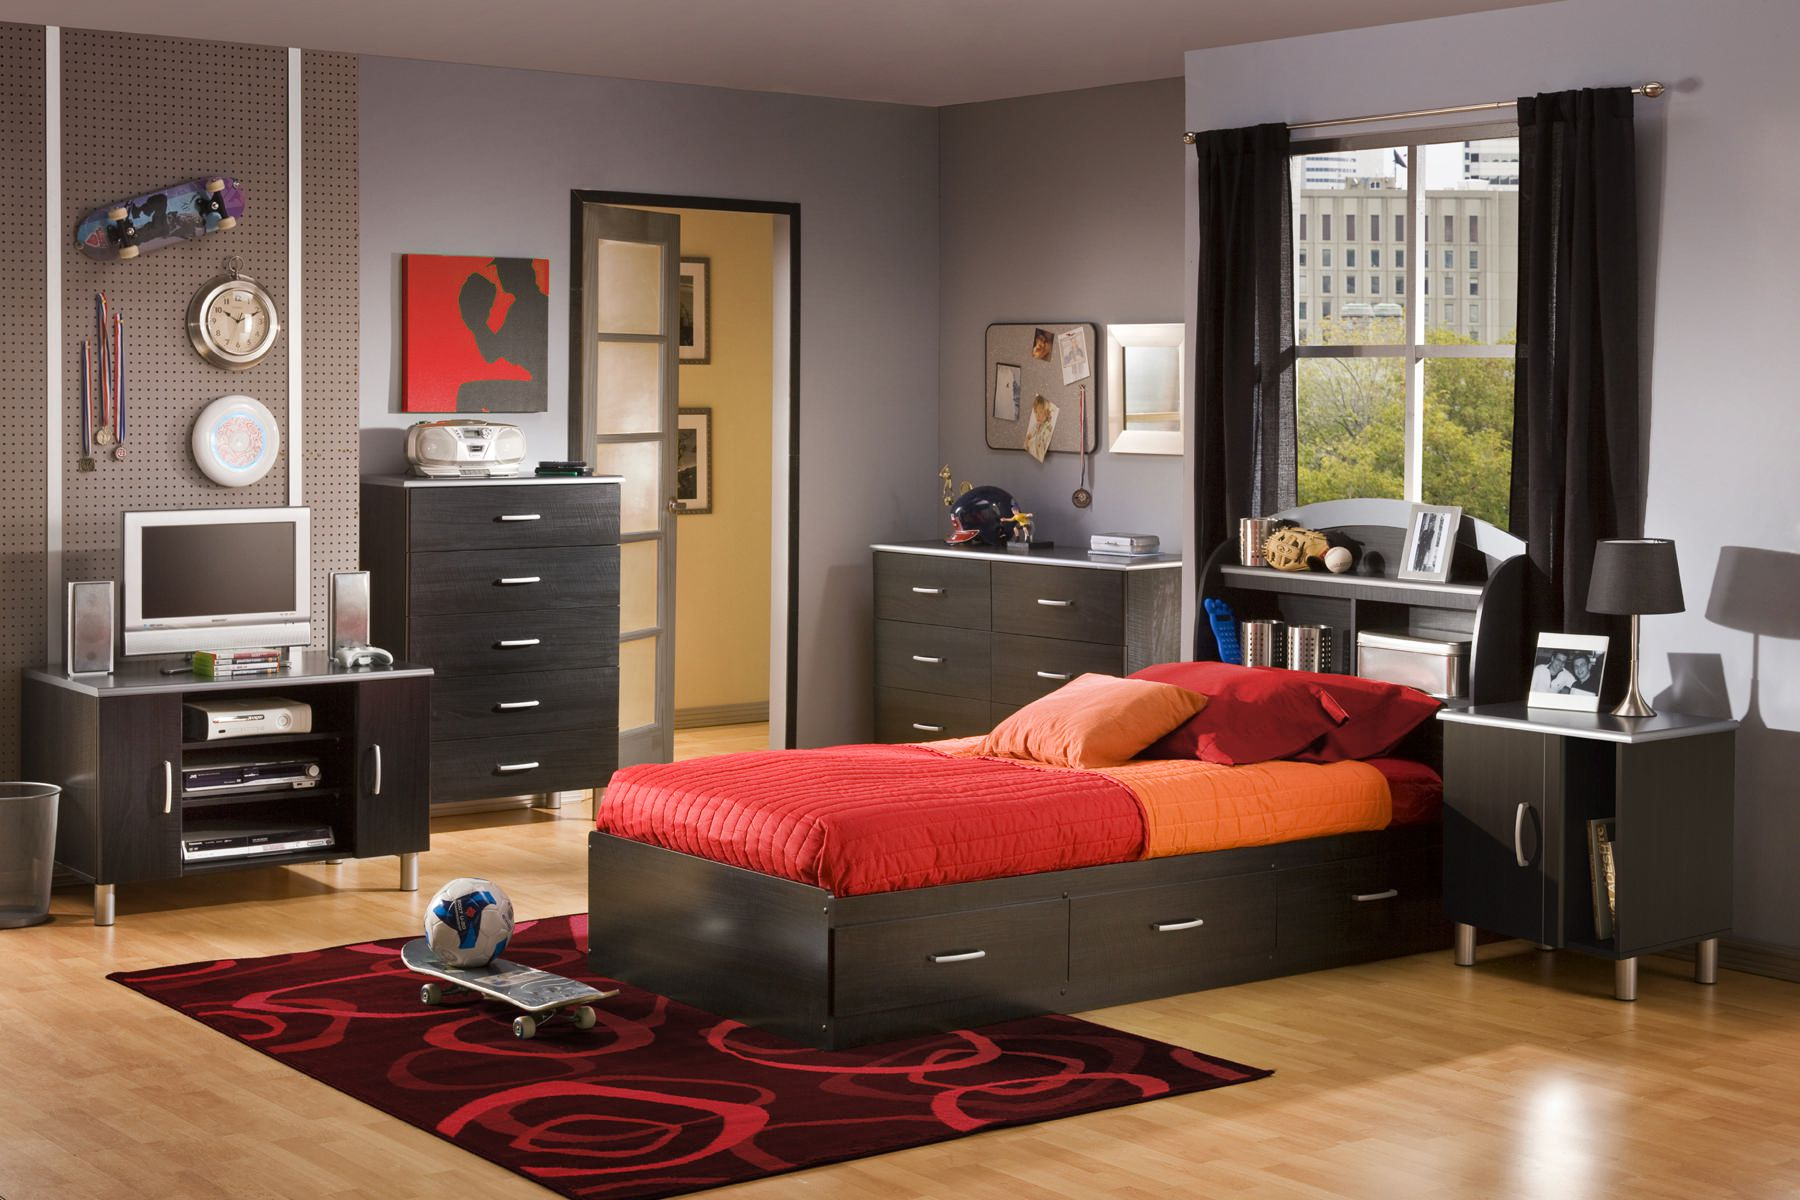 sets beds vanity to black frame twin for go bed queen size kids design rooms bedroom sale vanit bunk